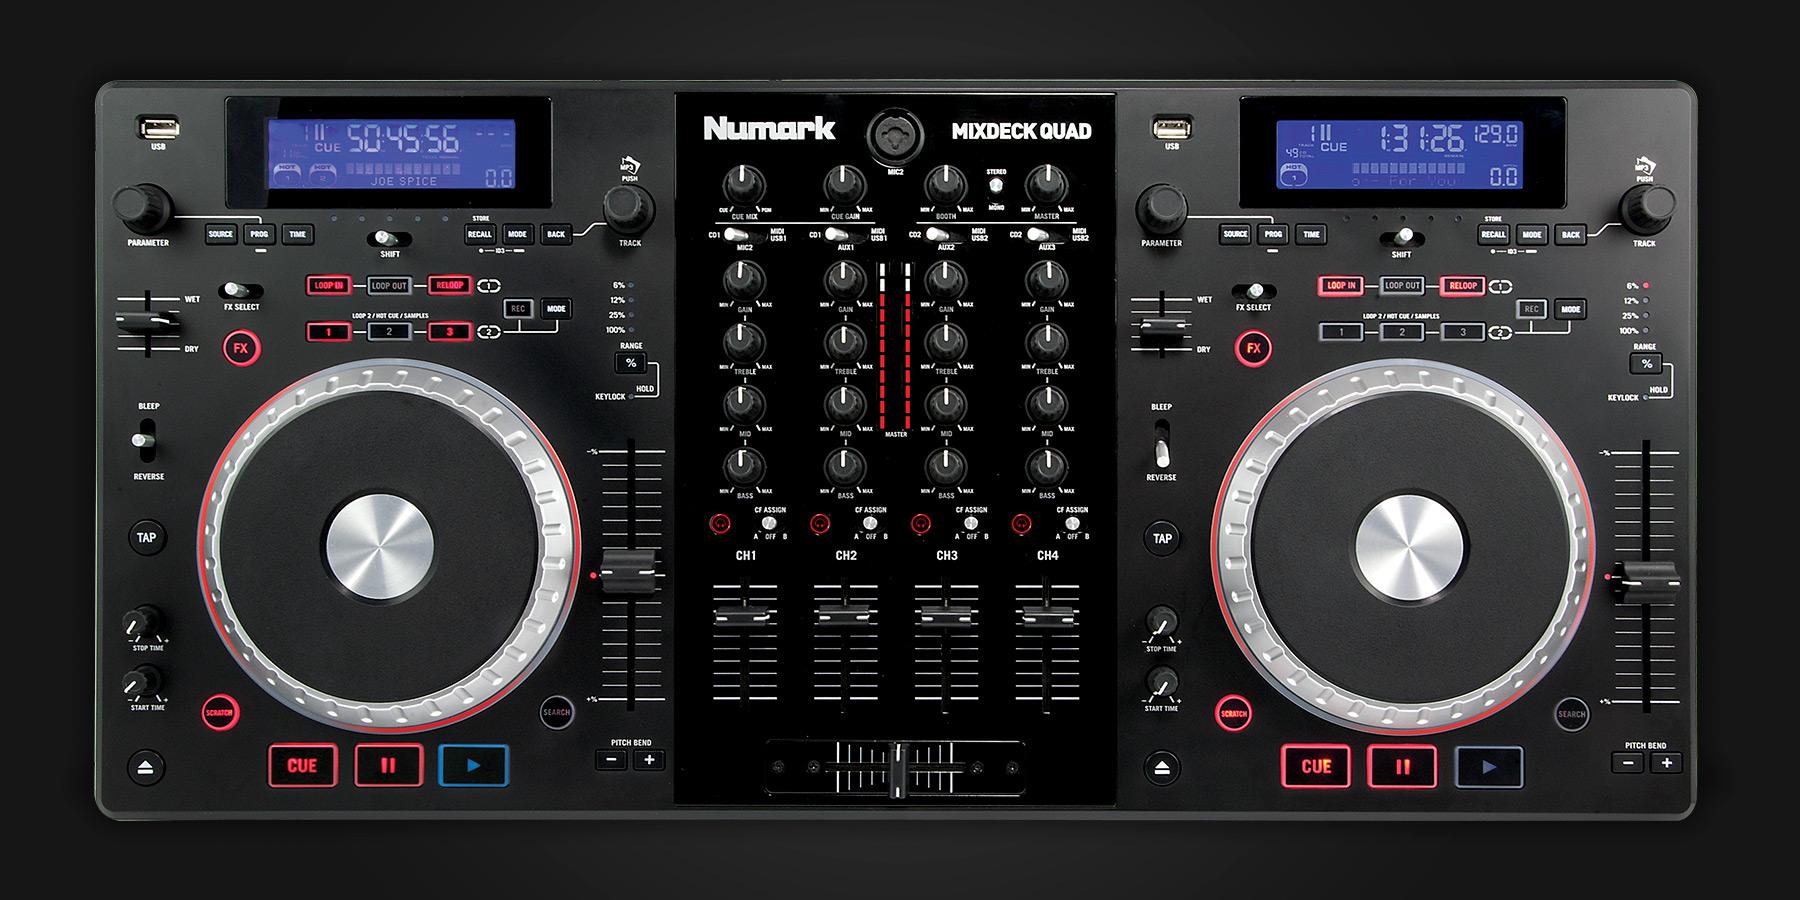 softwares numark mixdeck quad firmware update